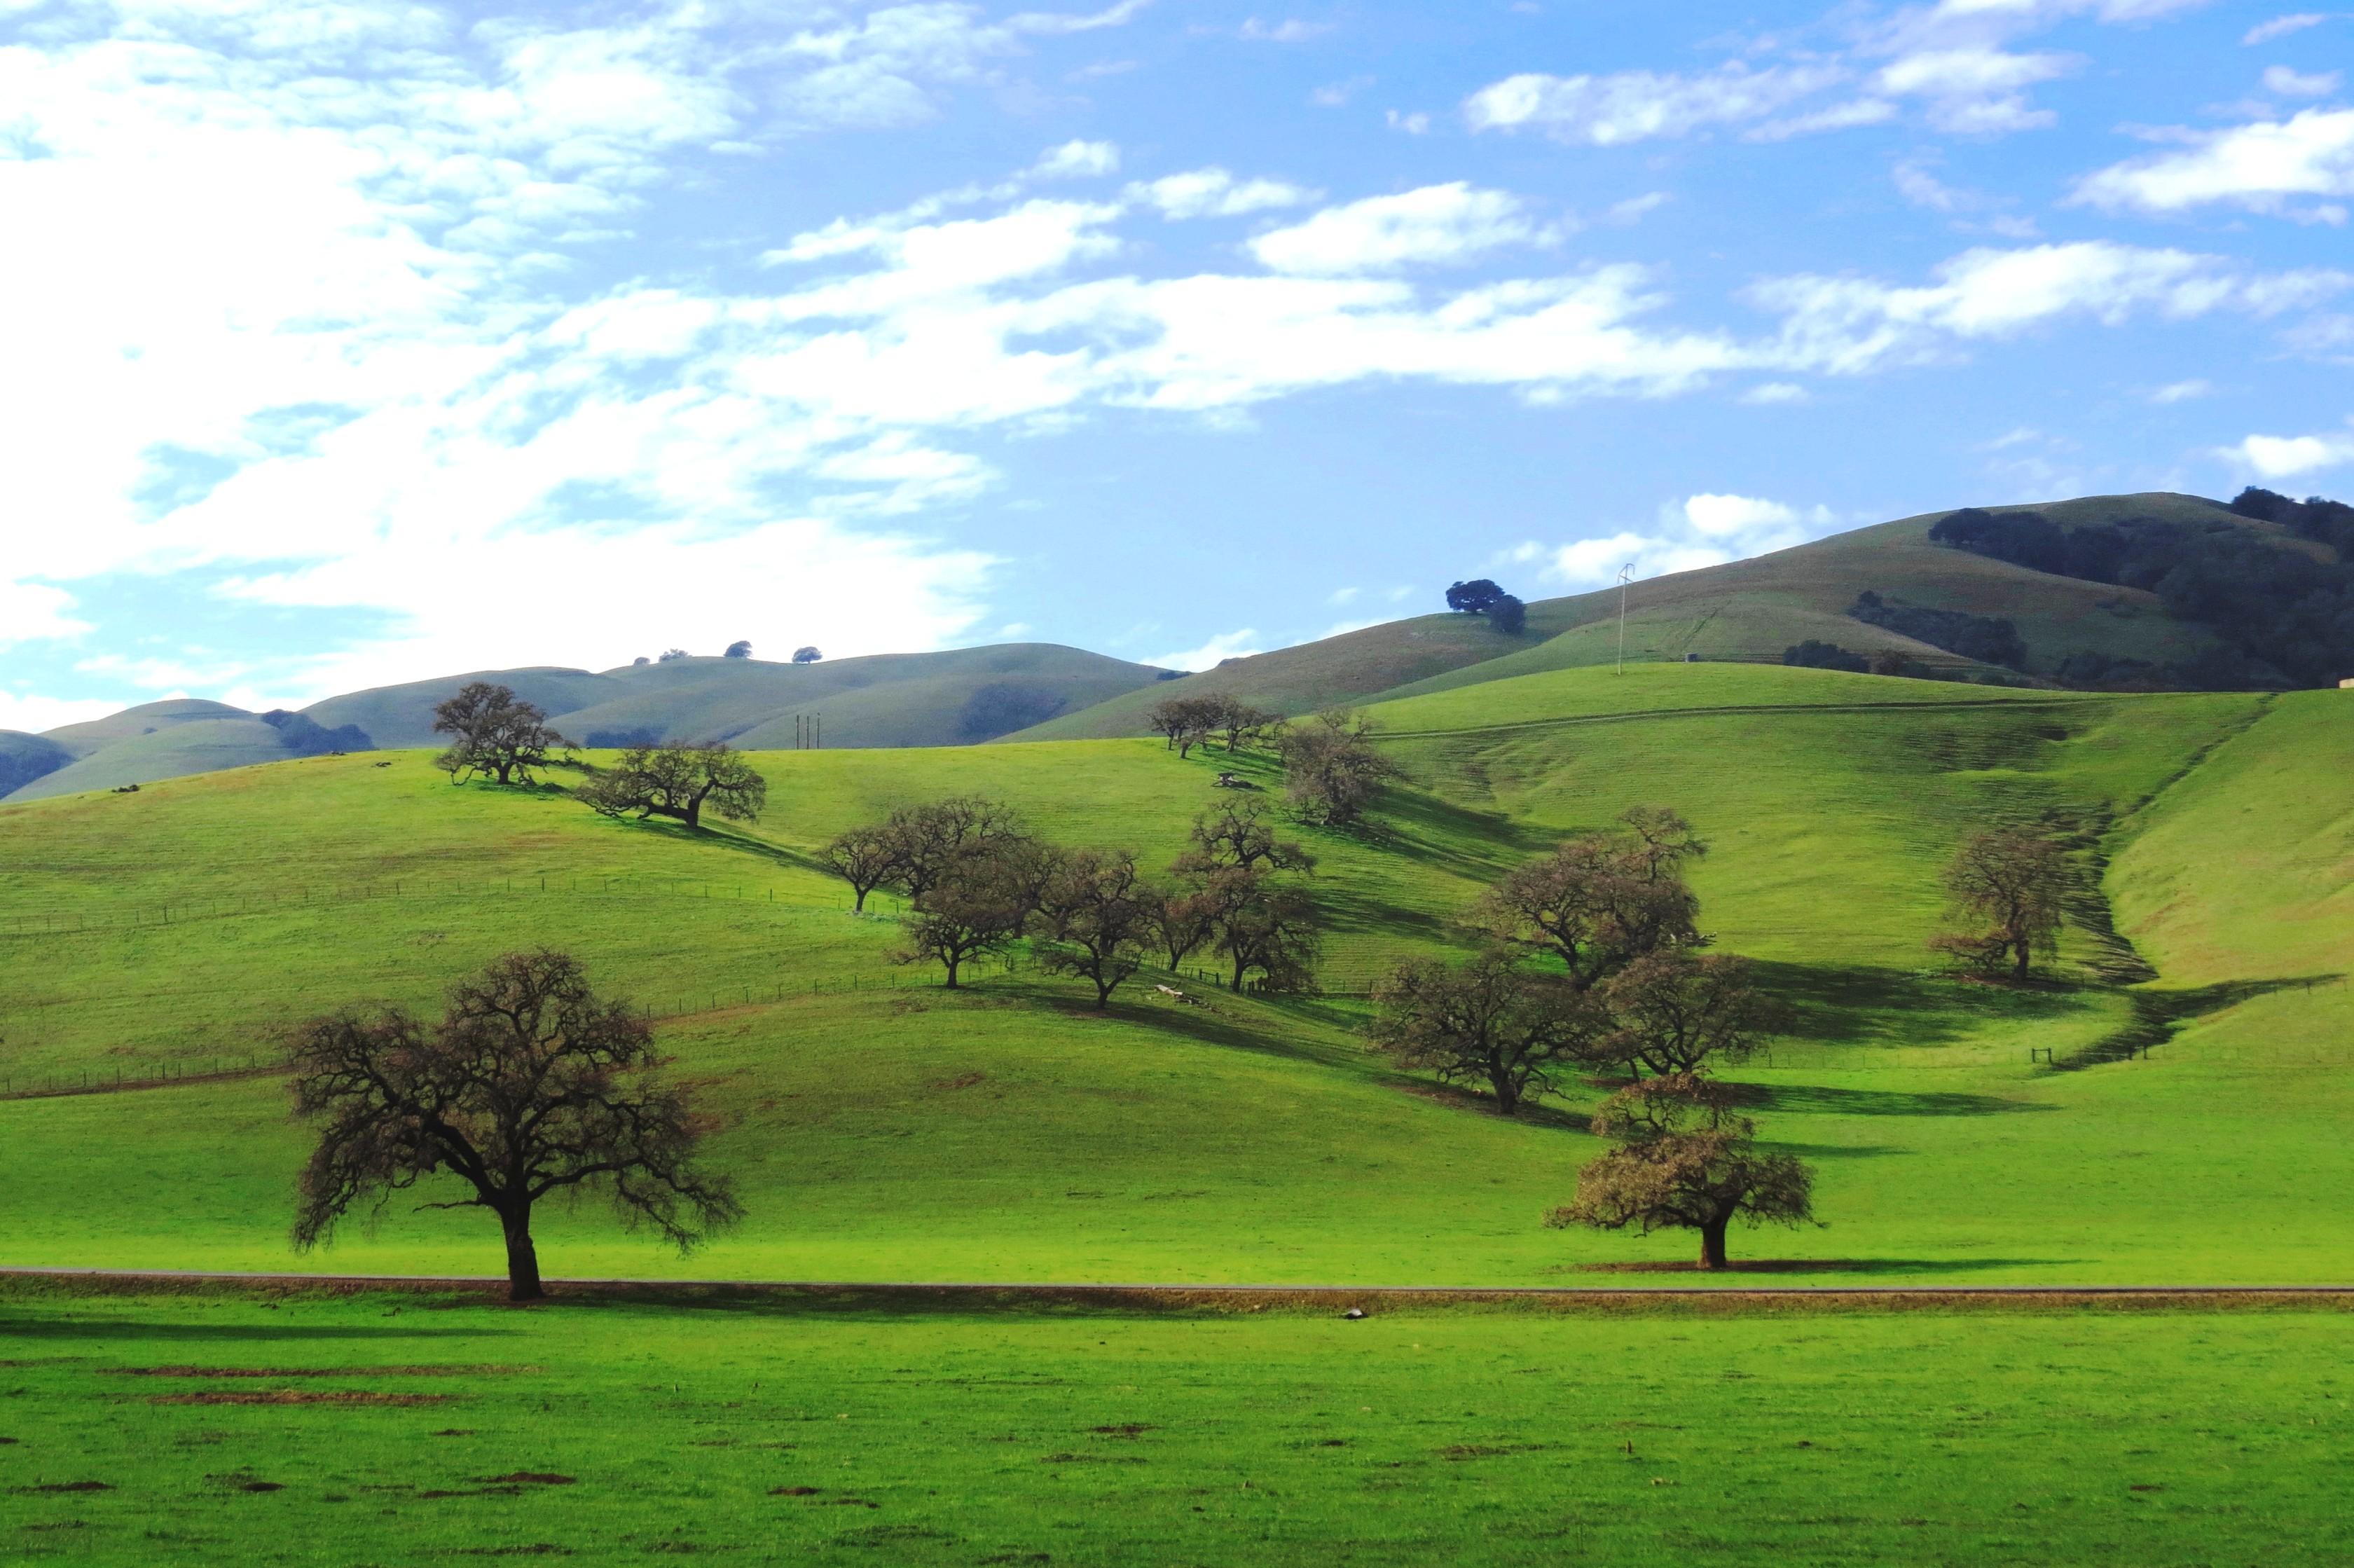 Wallpaper Green Grass Valley Trees Photo Flckr